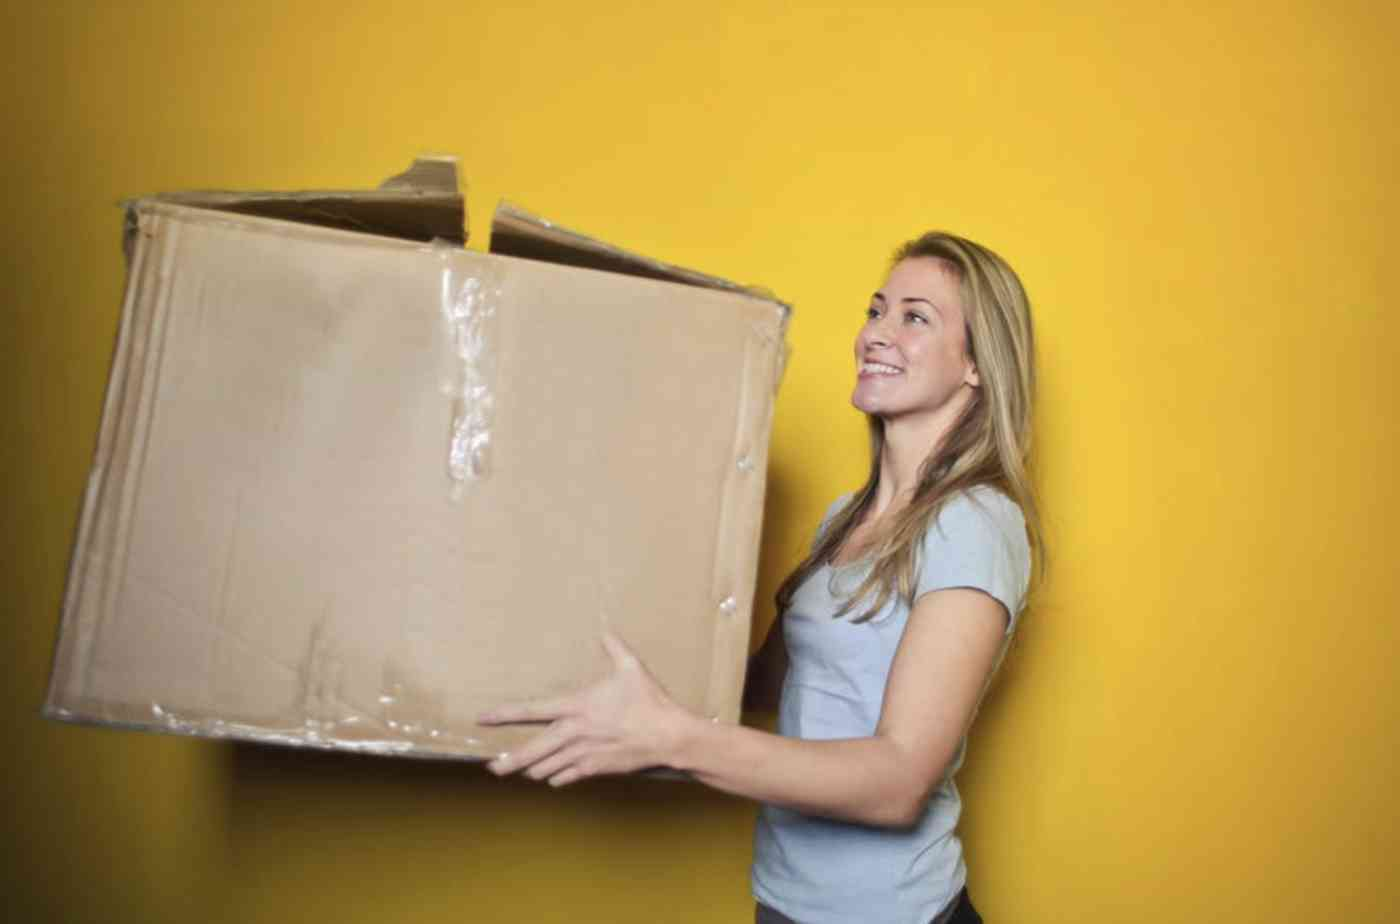 Woman holding a large box